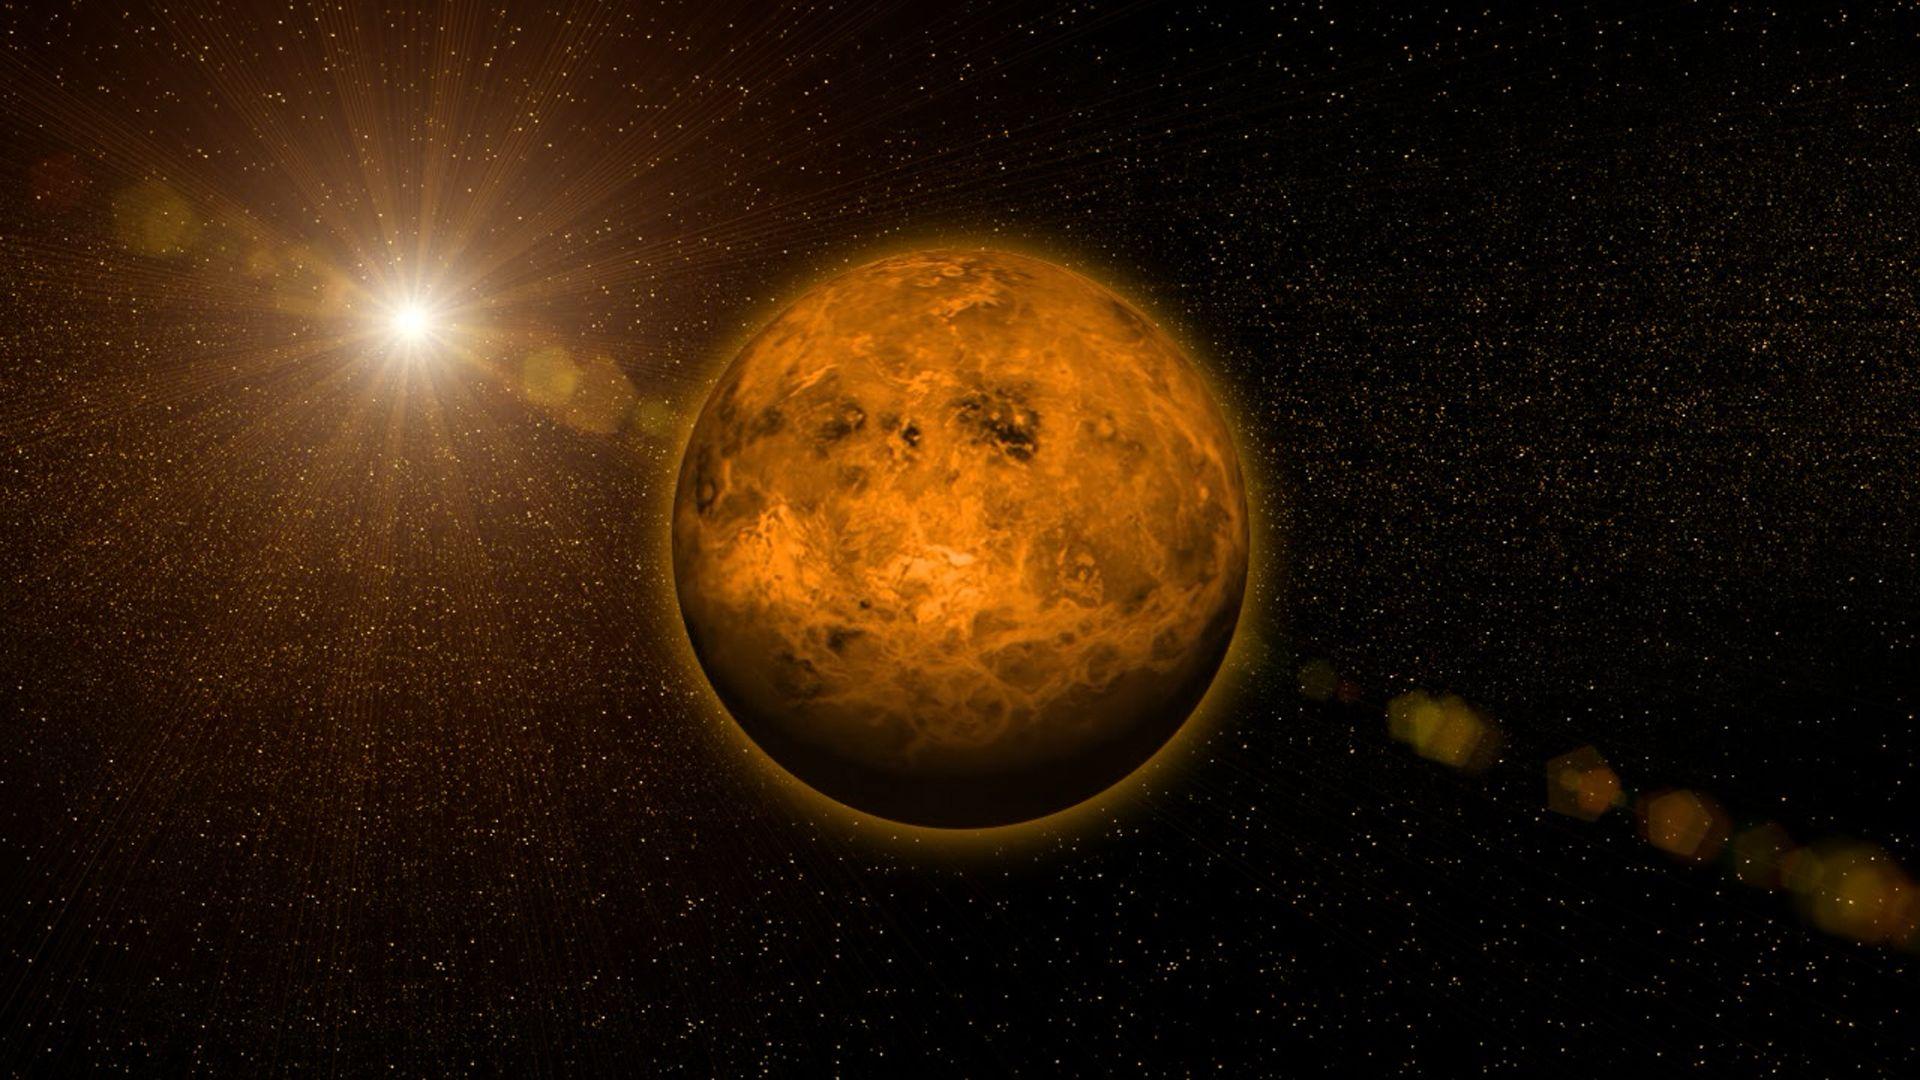 Planet venus wallpaper bing images to be inspired arkarrows planet venus wallpaper bing images voltagebd Choice Image